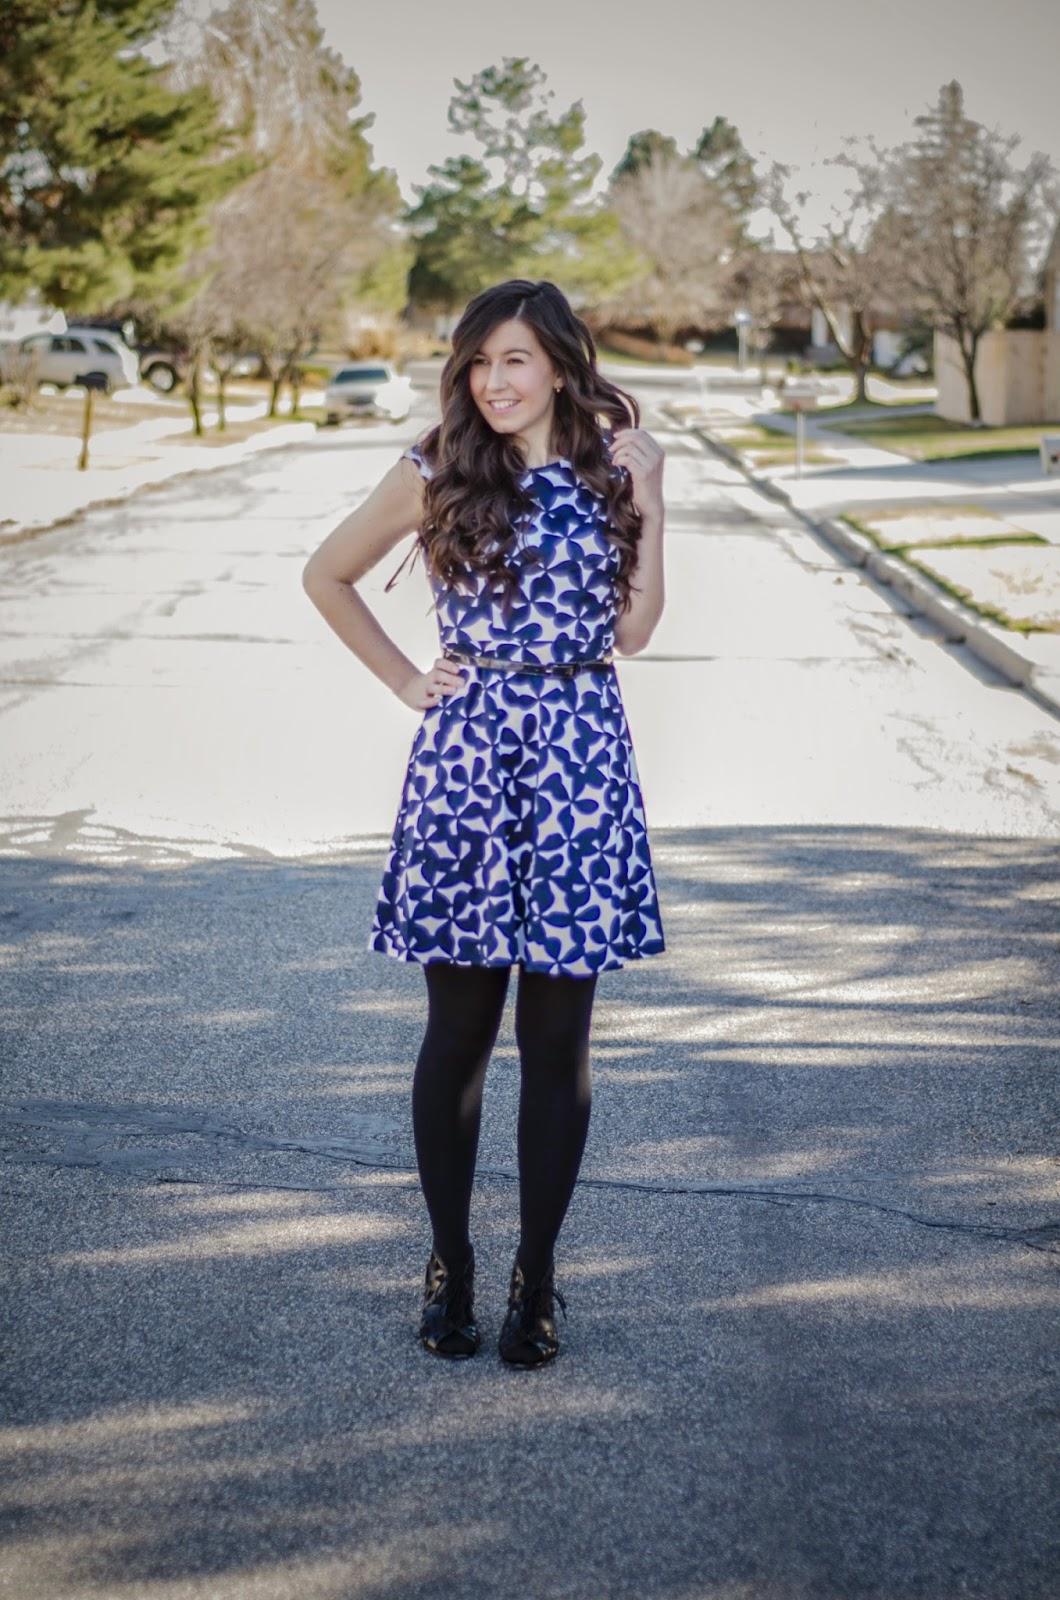 INC clothing, Macy's dress, macys, floral dress, blue and white dress, pretty dress, black wedges, cut out wedges, fit and flare dress, cute dress,